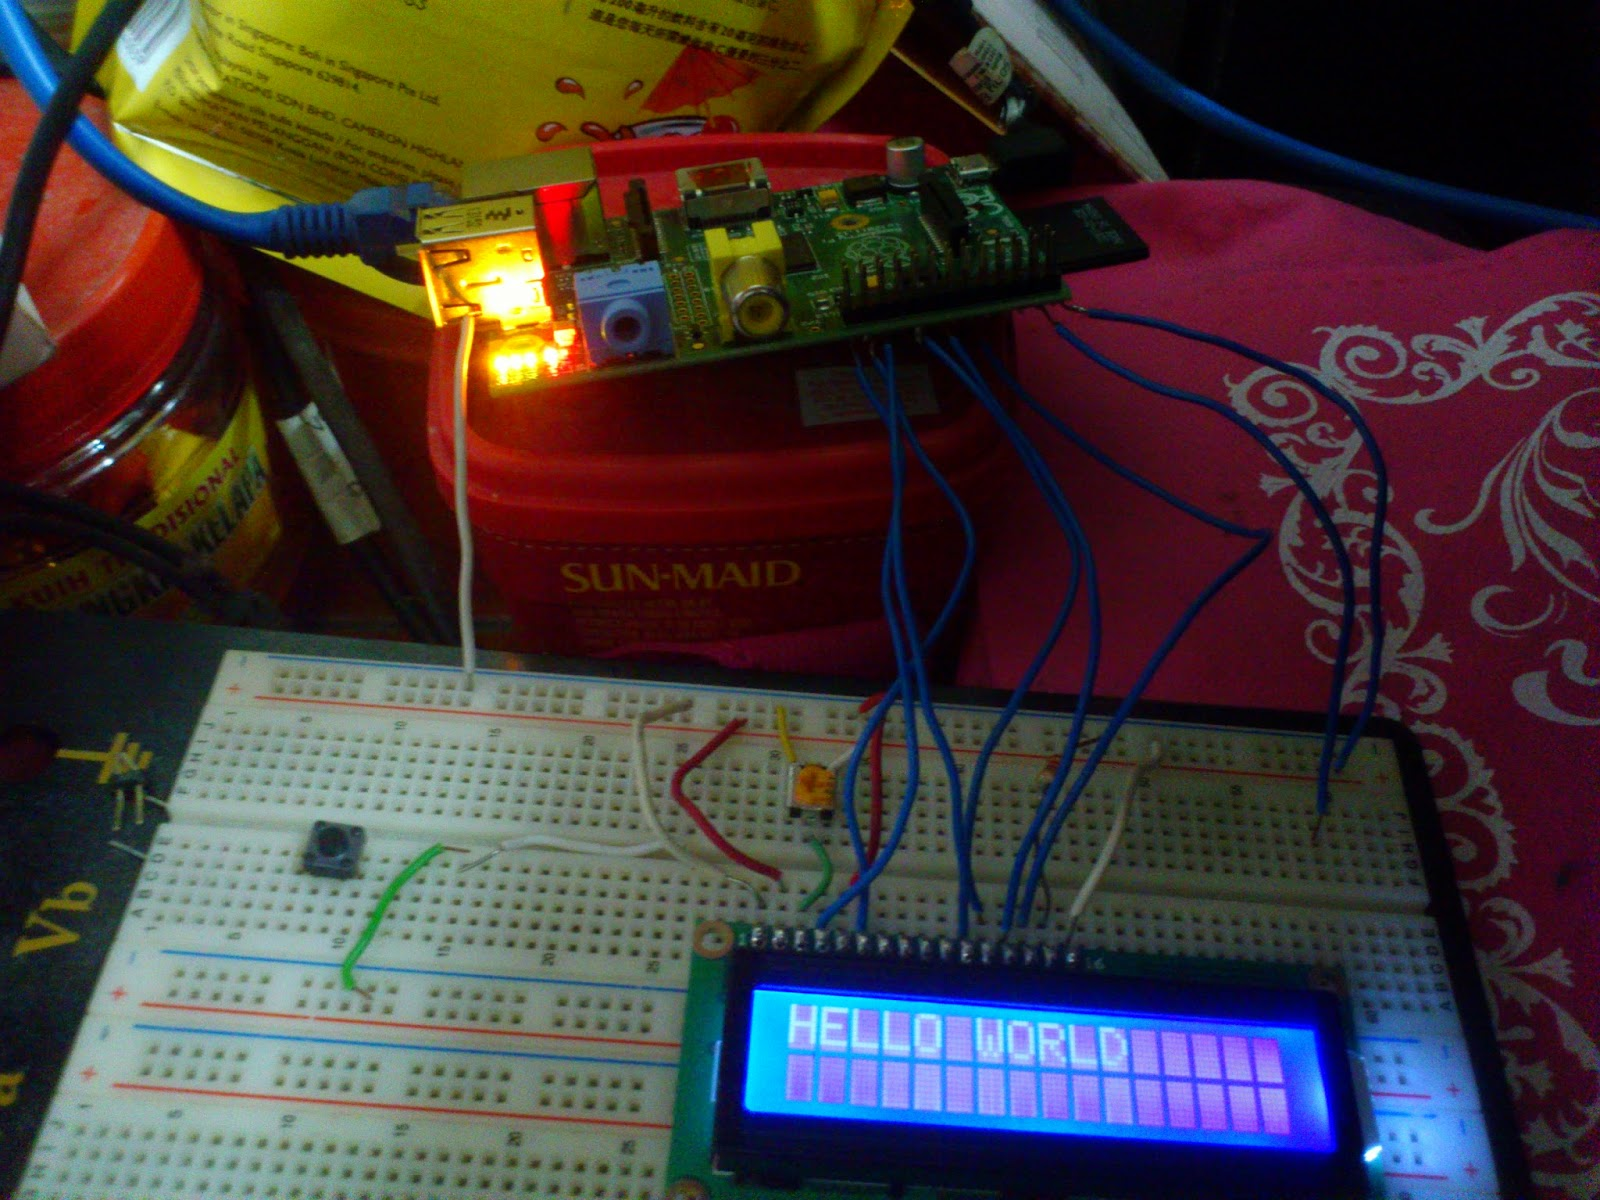 Programming Tutorial: 16x2 LCD Hello World (using C